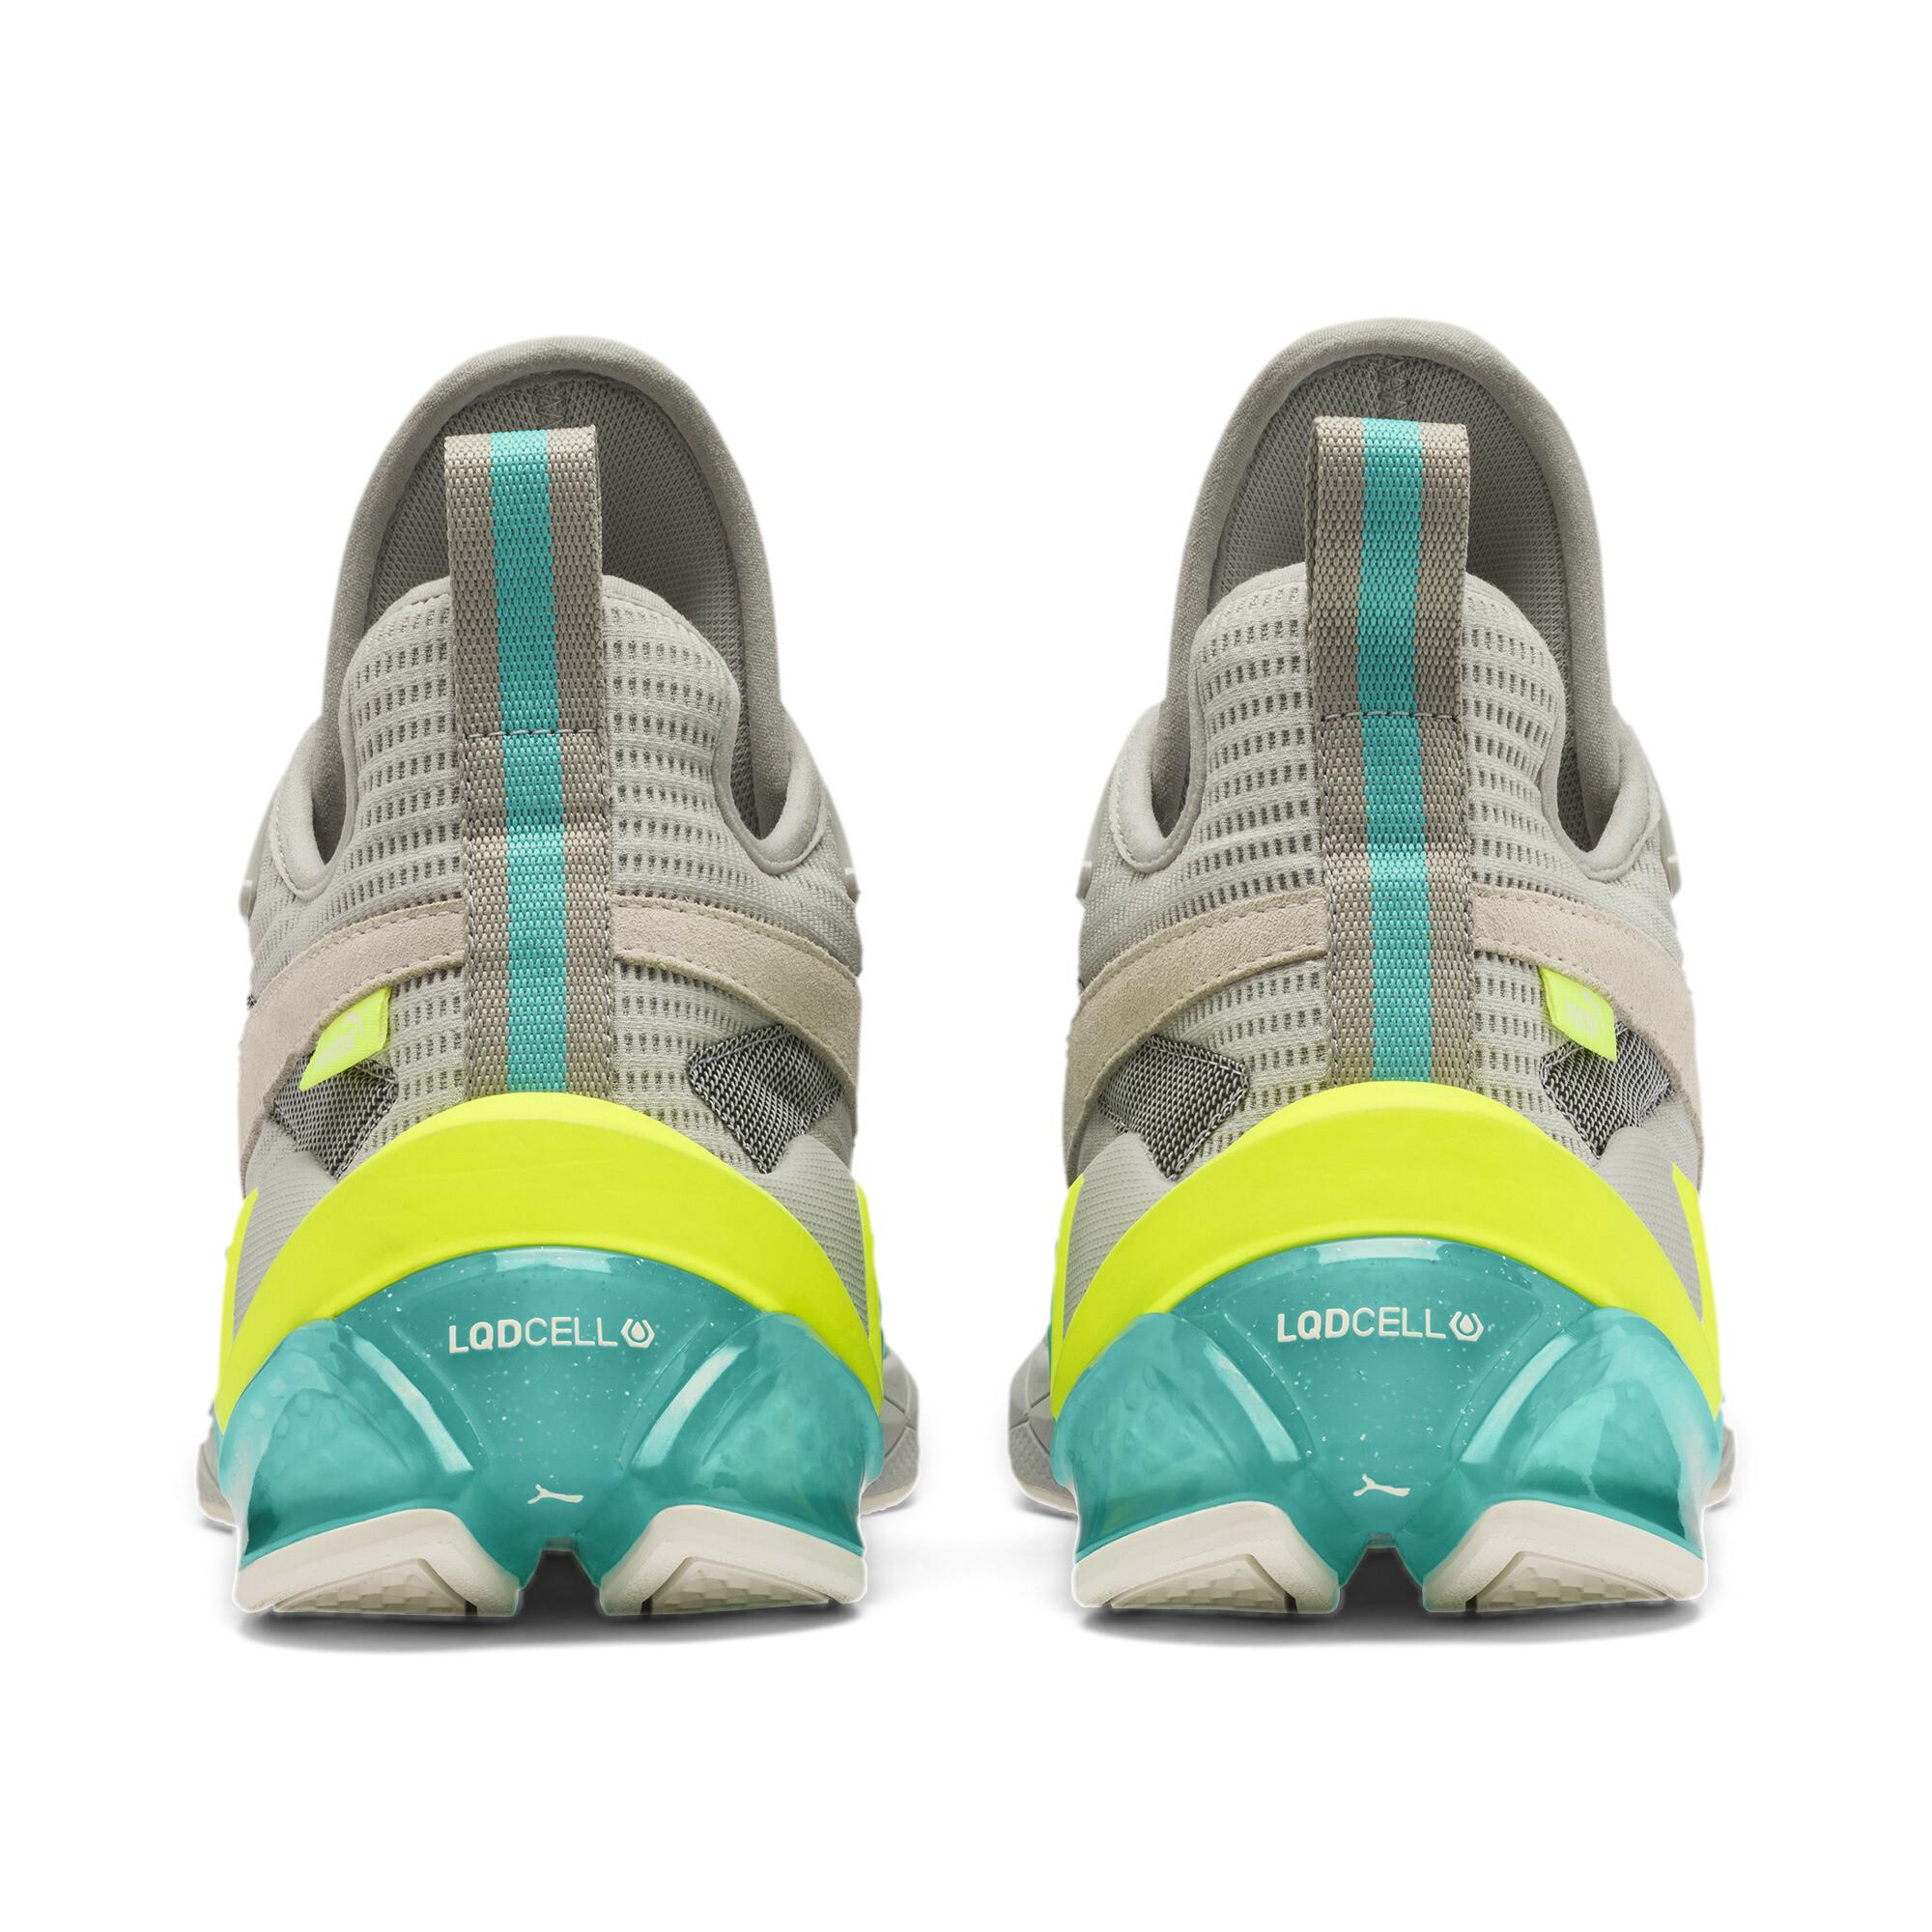 PUMA-Men-039-s-LQDCELL-Origin-Training-Shoes thumbnail 9